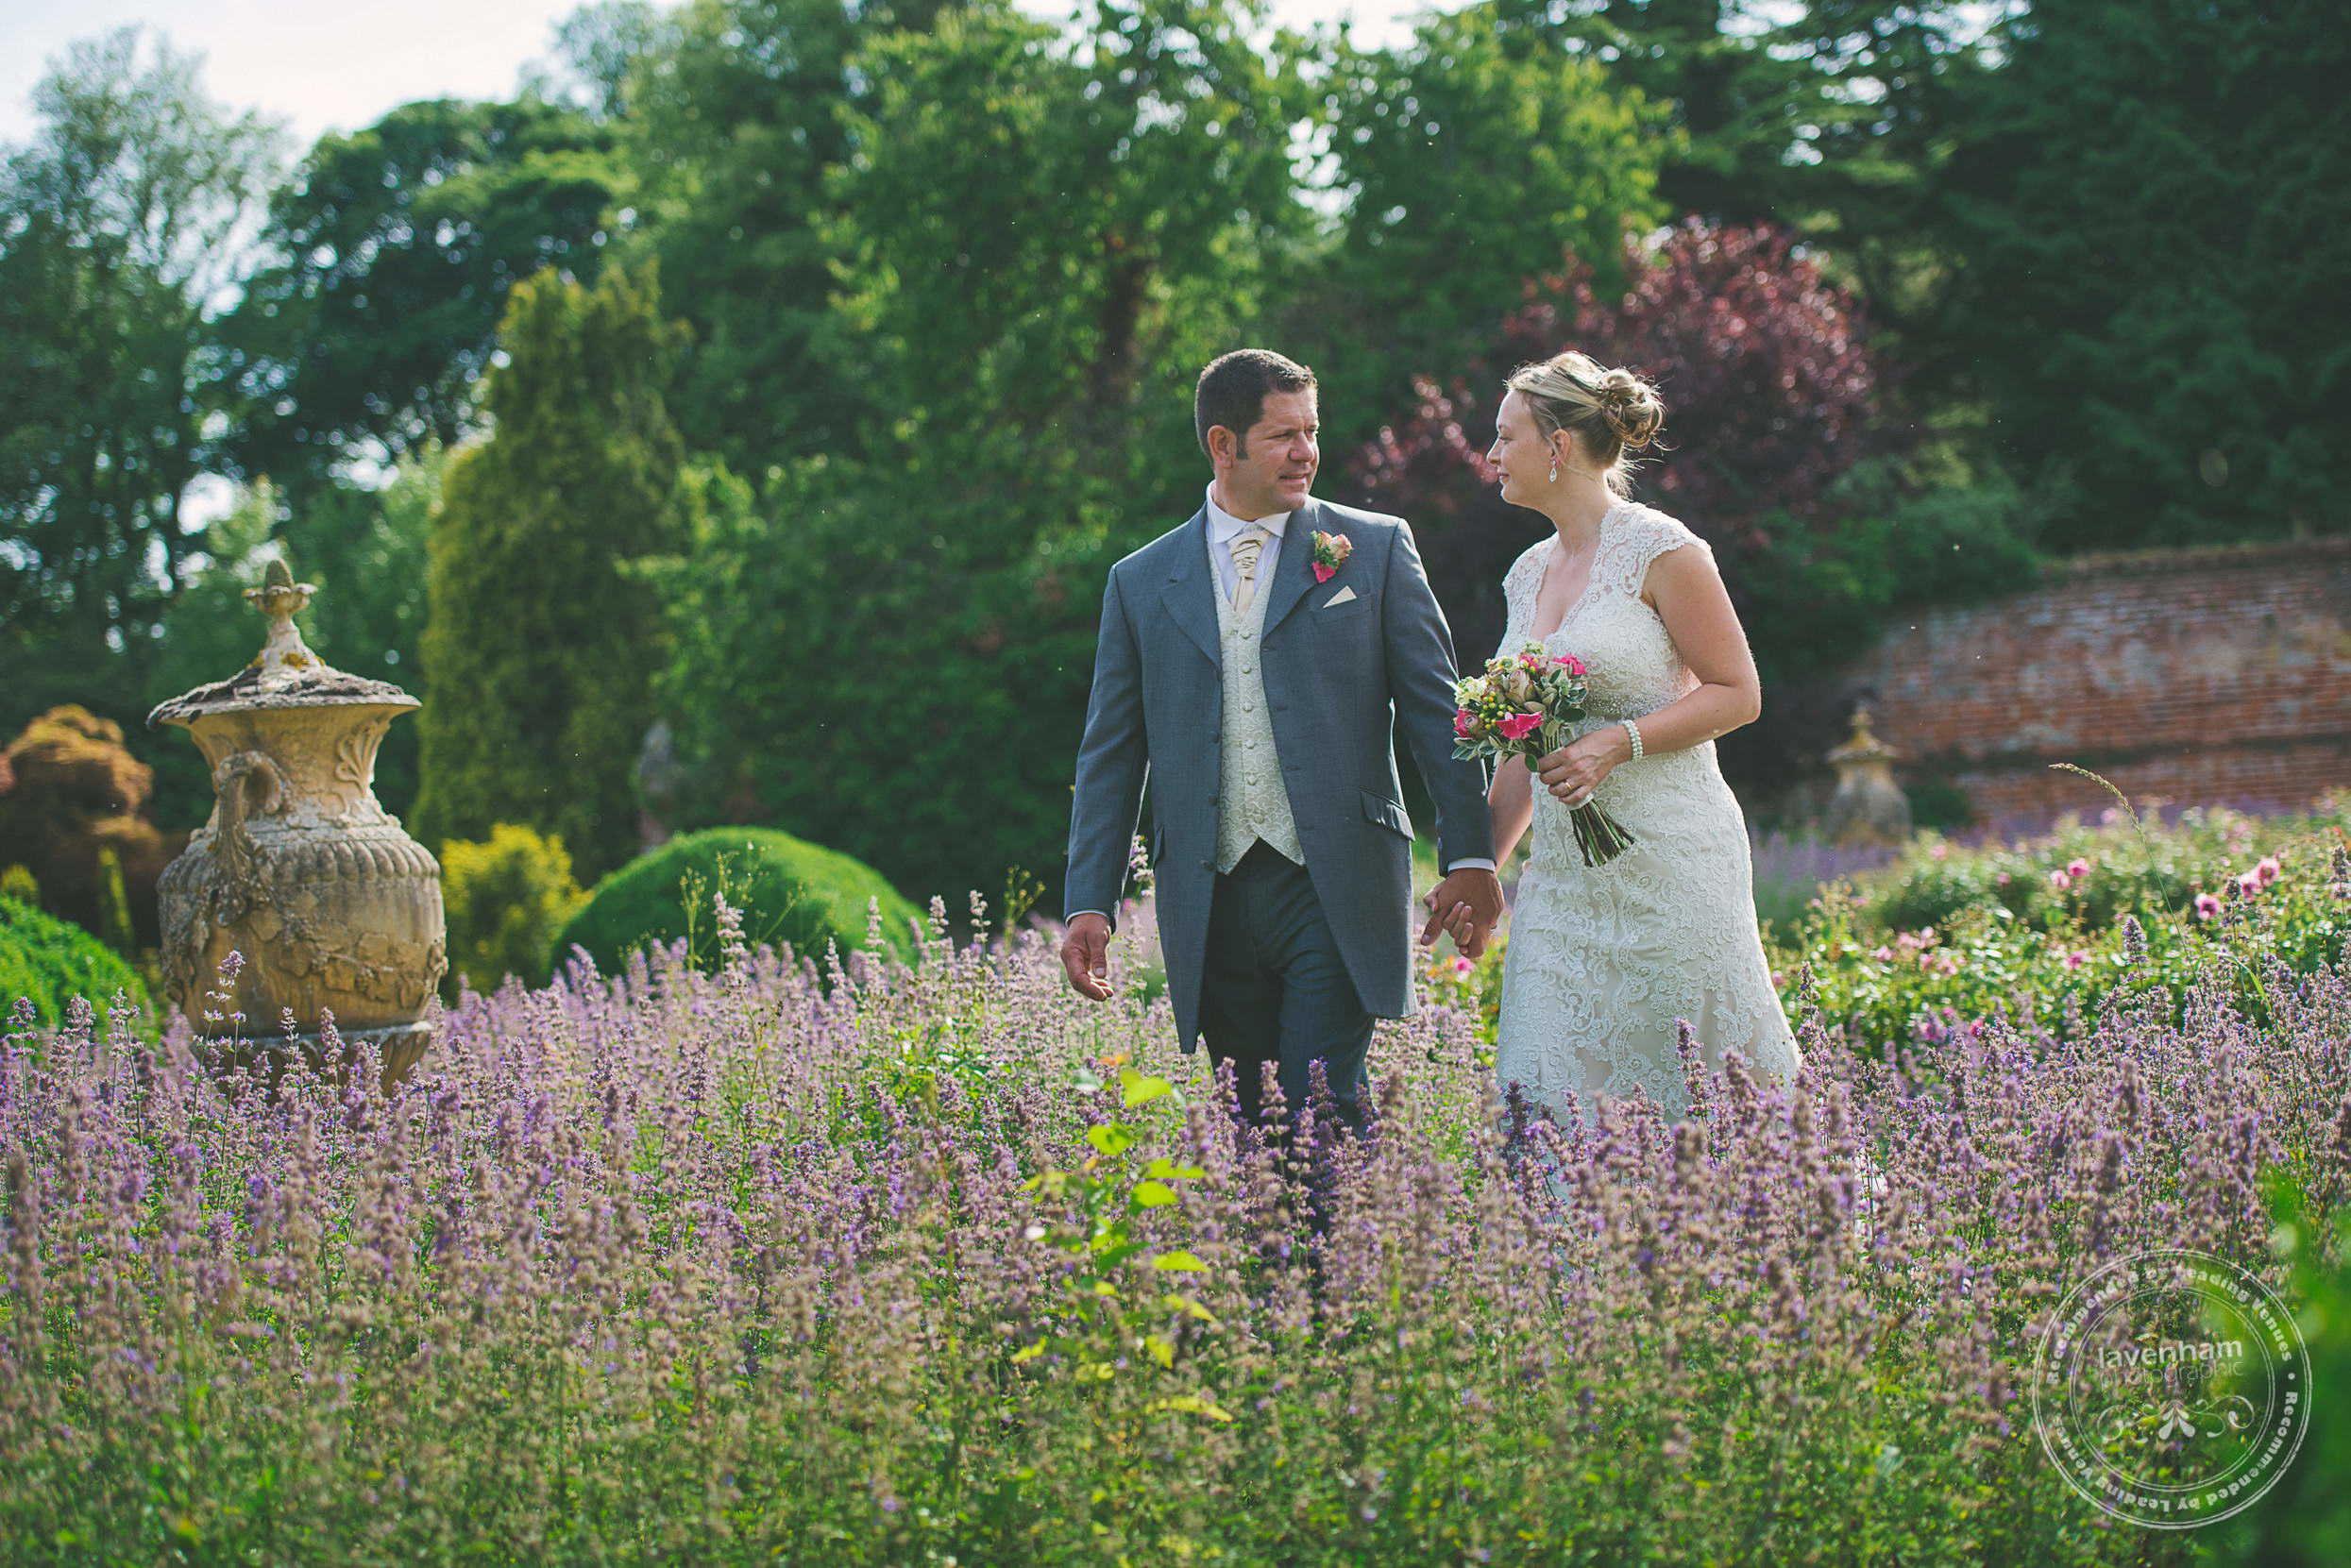 180715-kentwell-hall-wedding-photographer-030